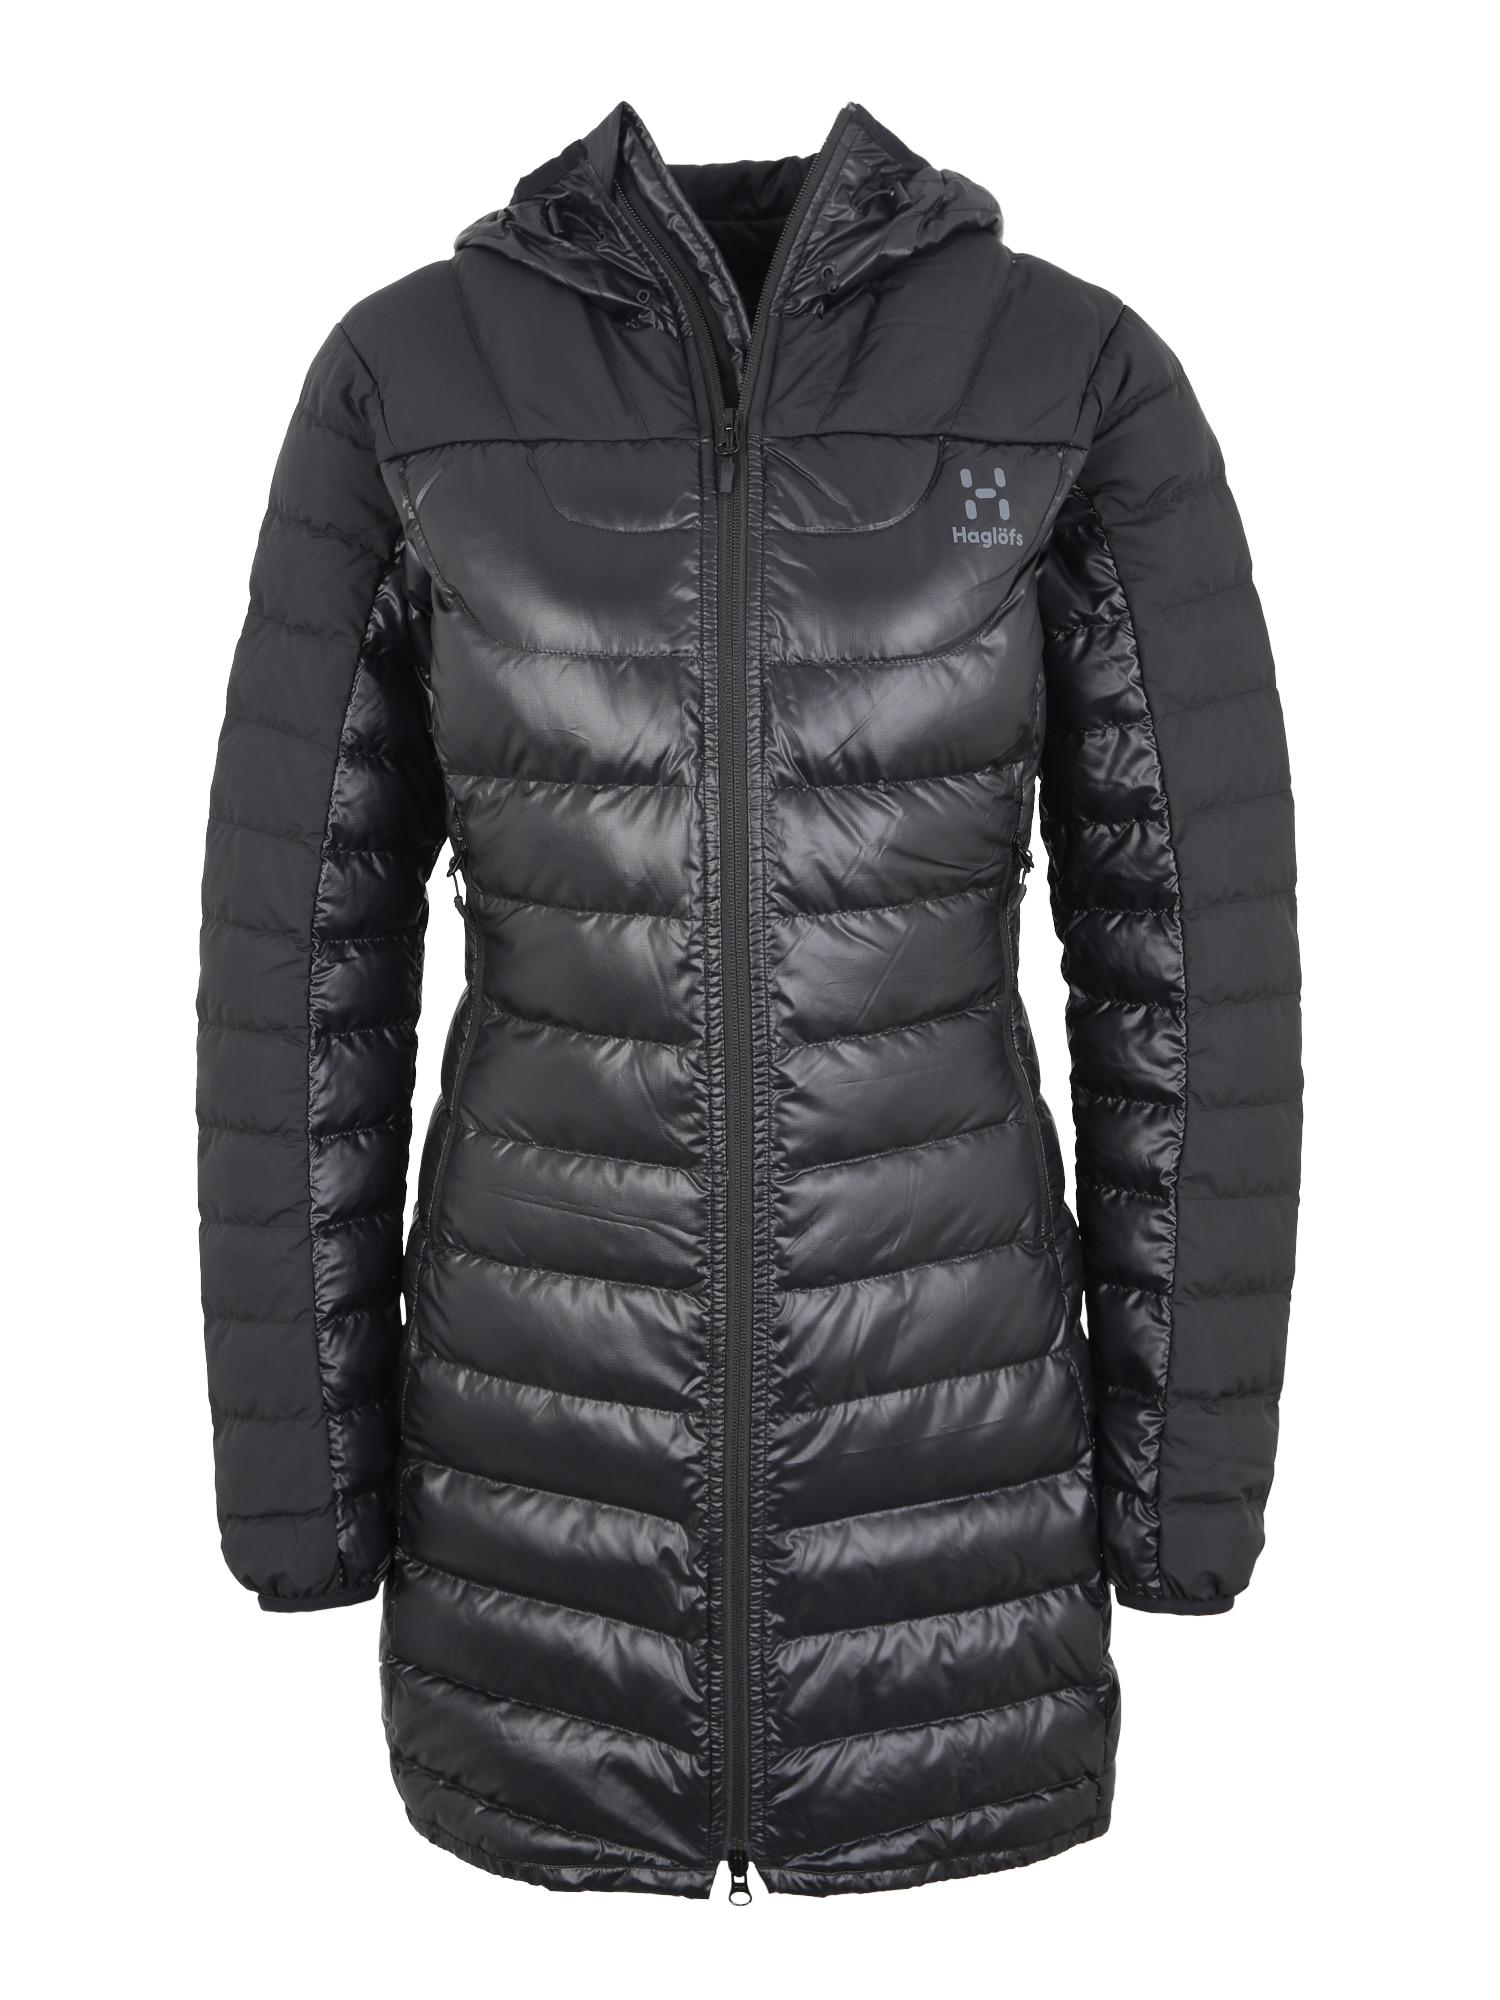 Outdoorová bunda Bivvy tmavě šedá Haglöfs